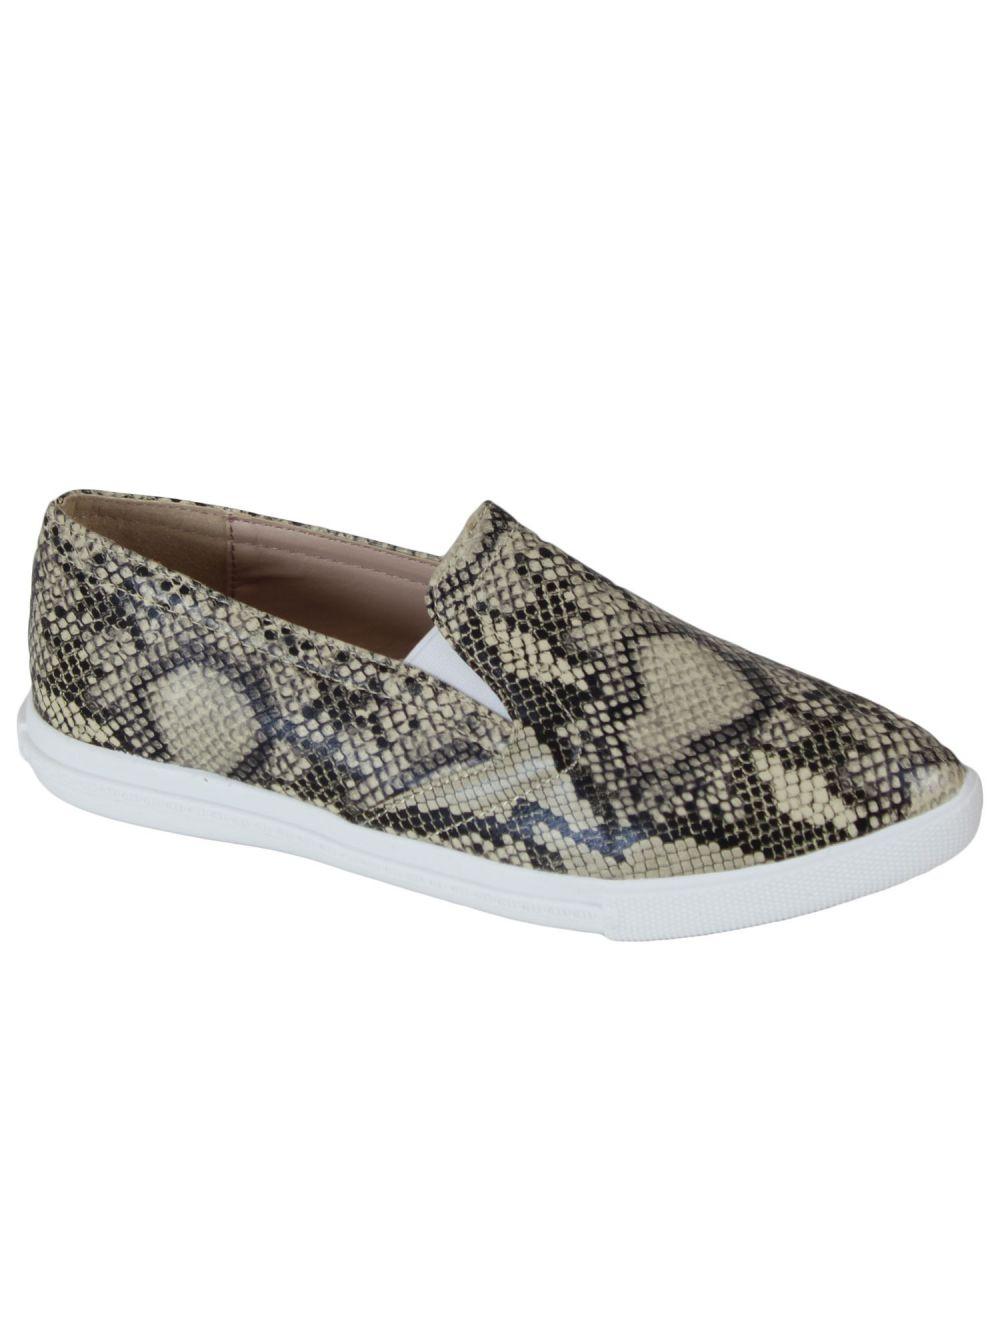 Basket slippers motifs python